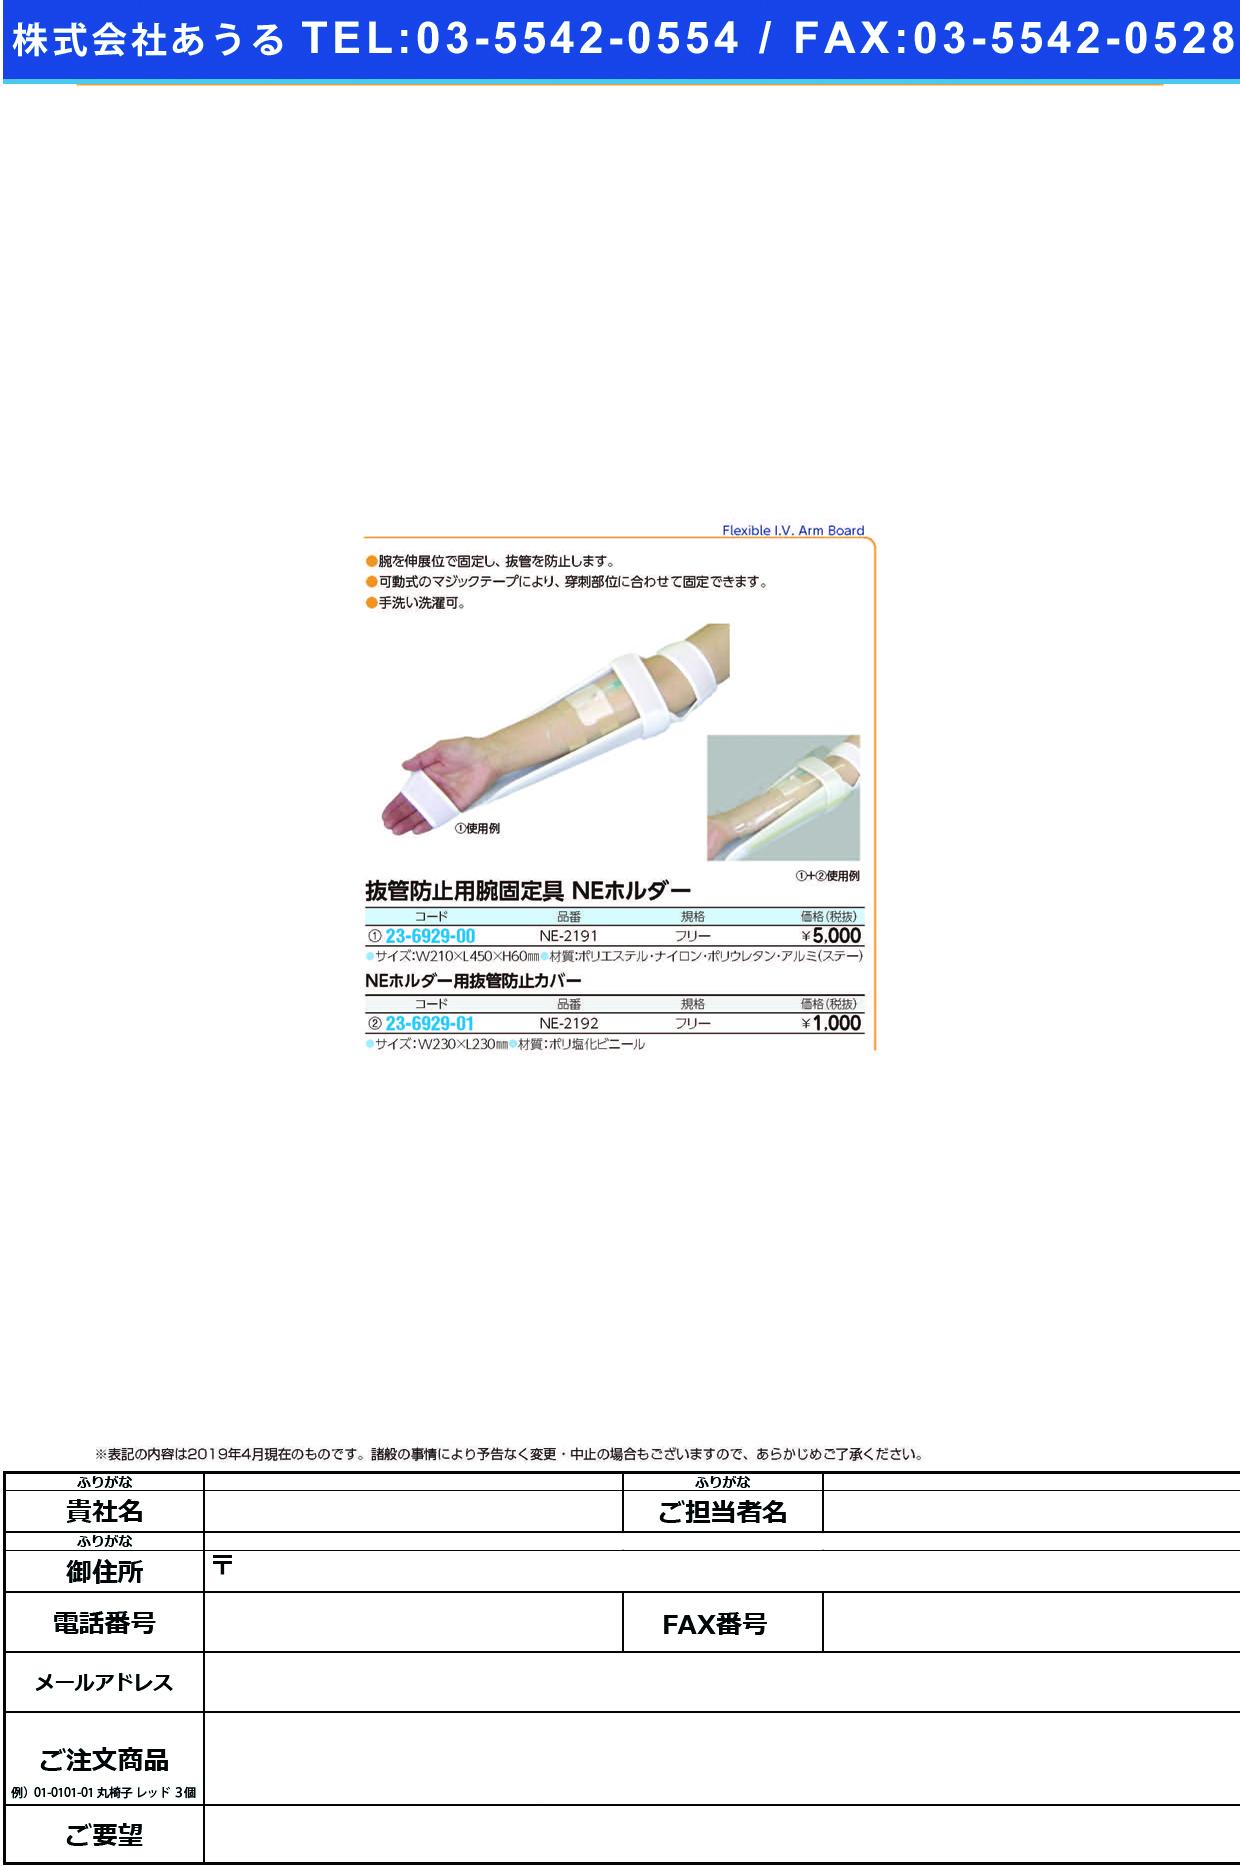 (23-6929-01)NEホルダー用抜管防止カバー NE-2192 NEホルダーバッカンボウシカバー(日本衛材)【1個単位】【2019年カタログ商品】